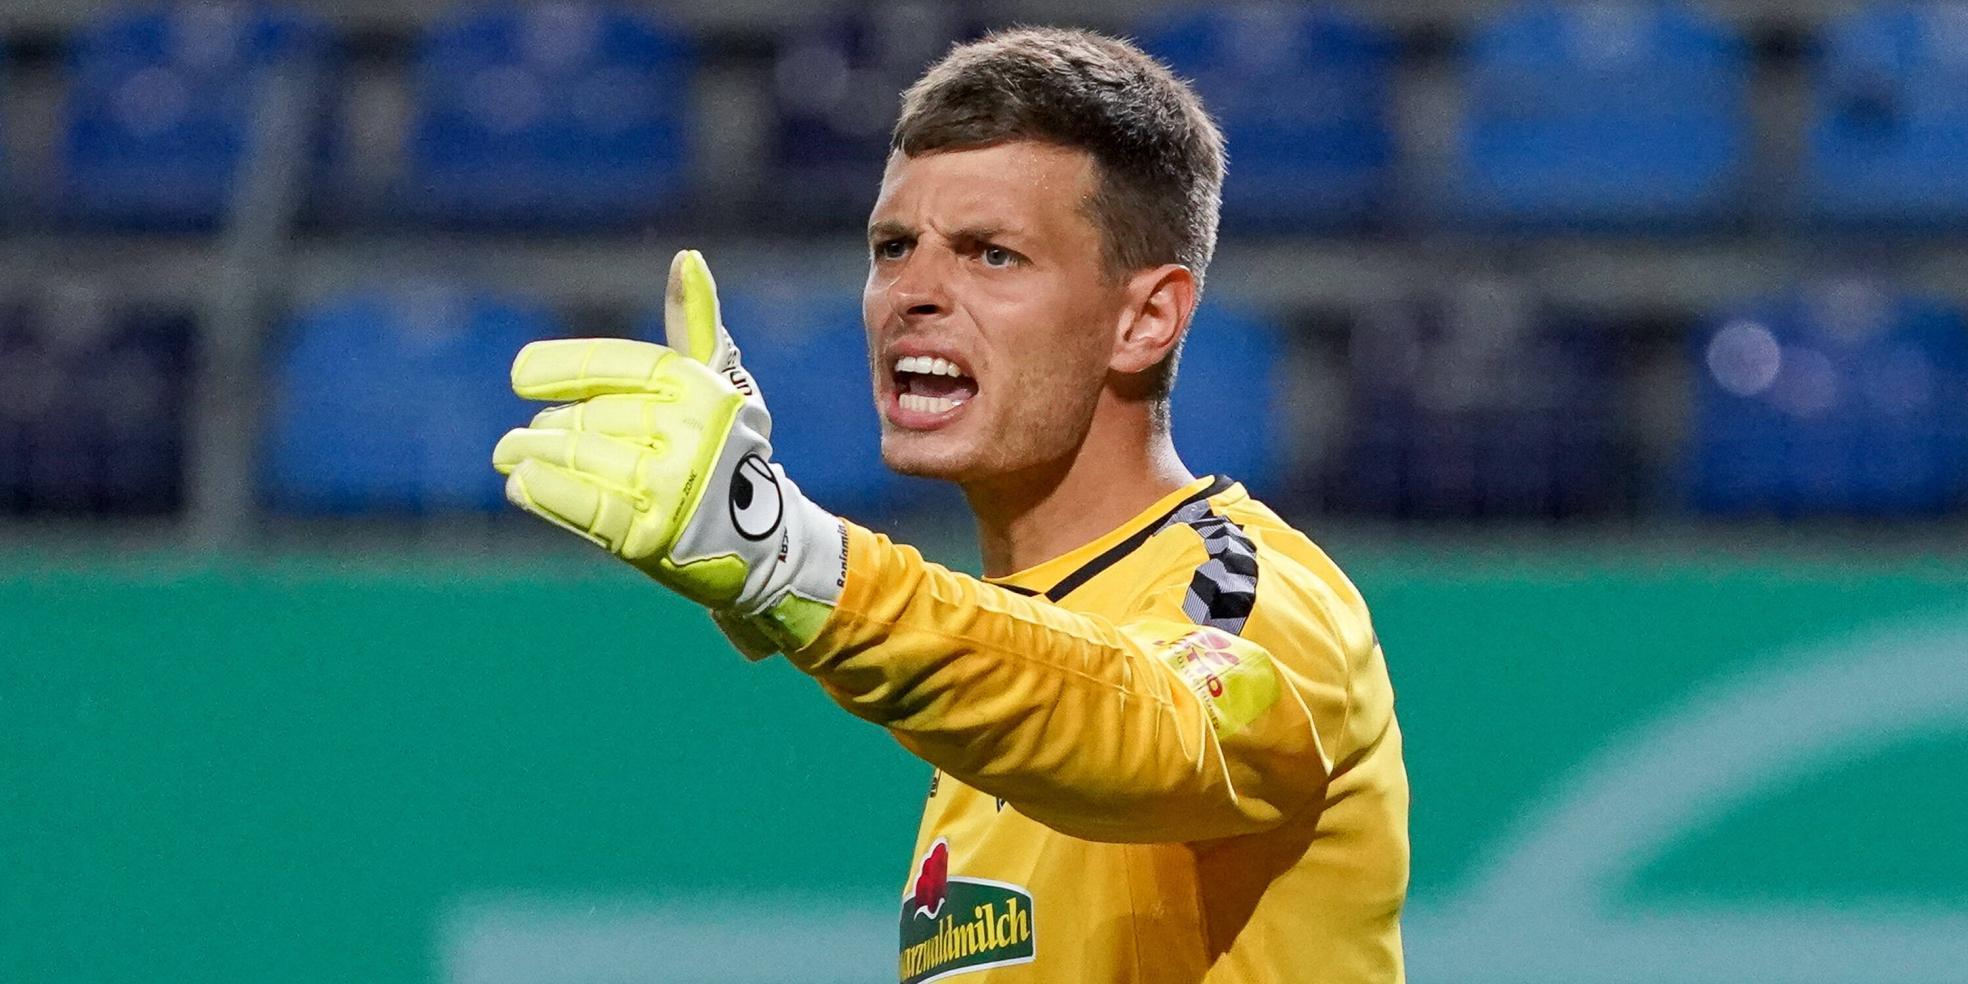 Benjamin Uphoff vom SC Freiburg